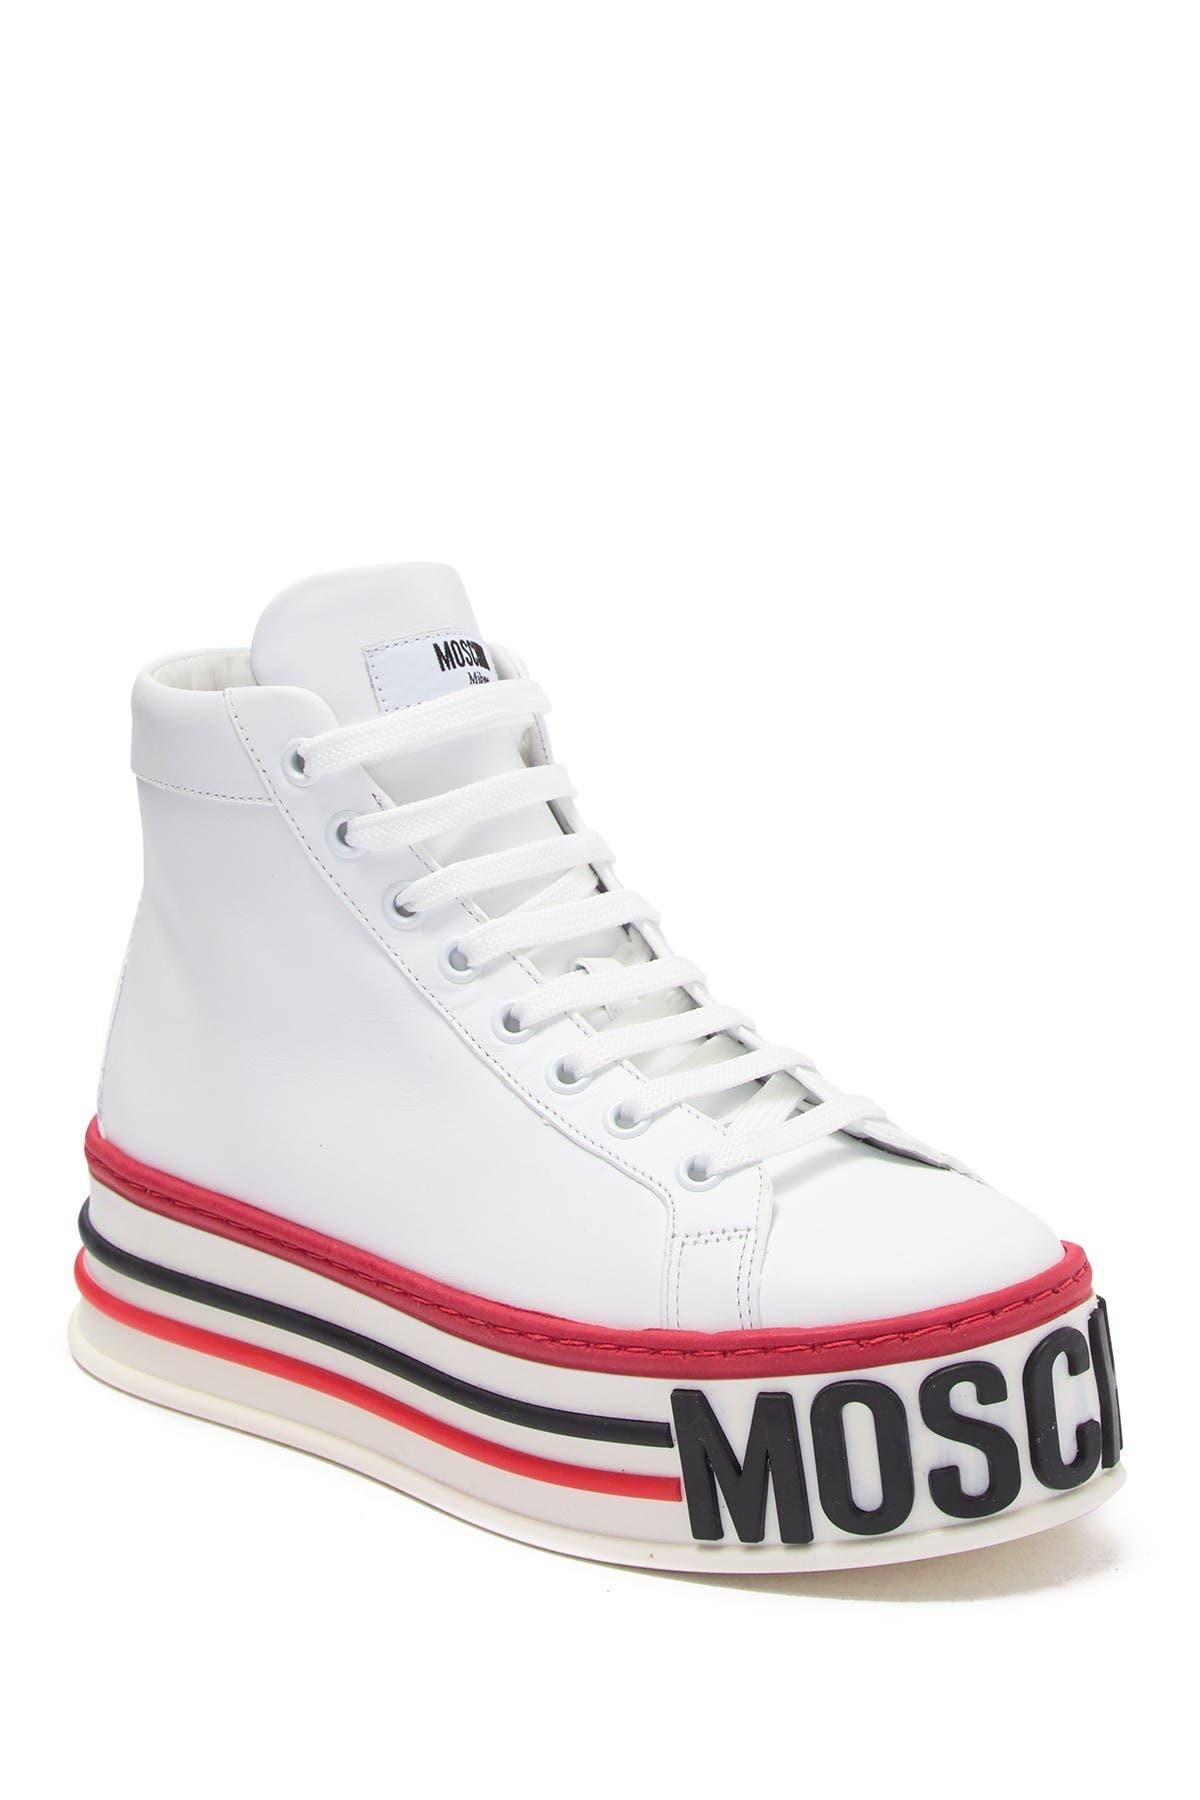 Image of MOSCHINO Brand Embossed High Top Platform Sneaker